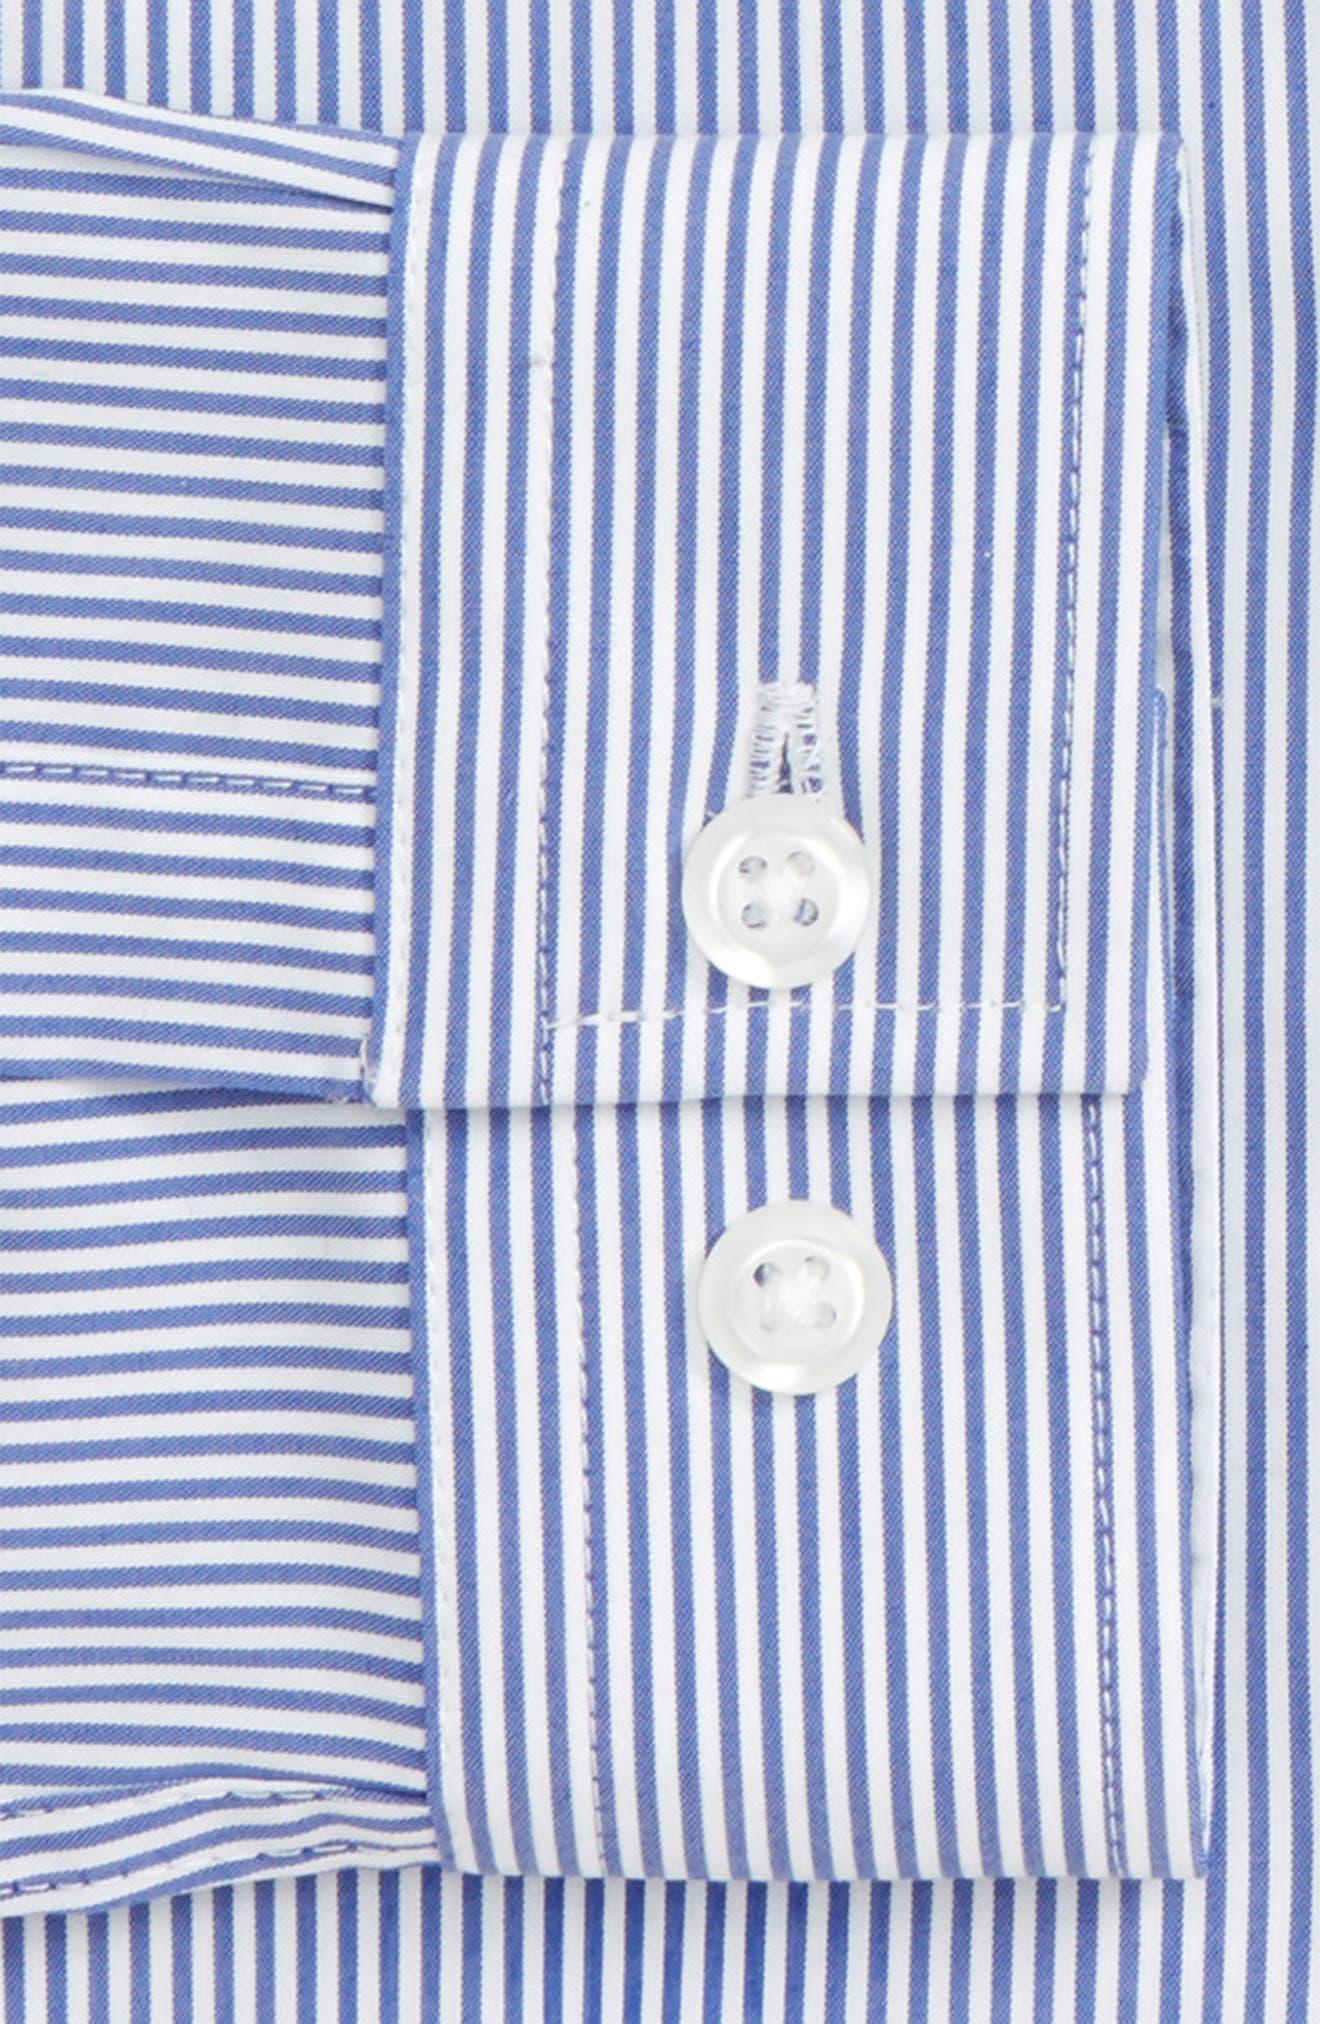 Muscle Fit Smart Shirt,                             Alternate thumbnail 4, color,                             Blue Multi